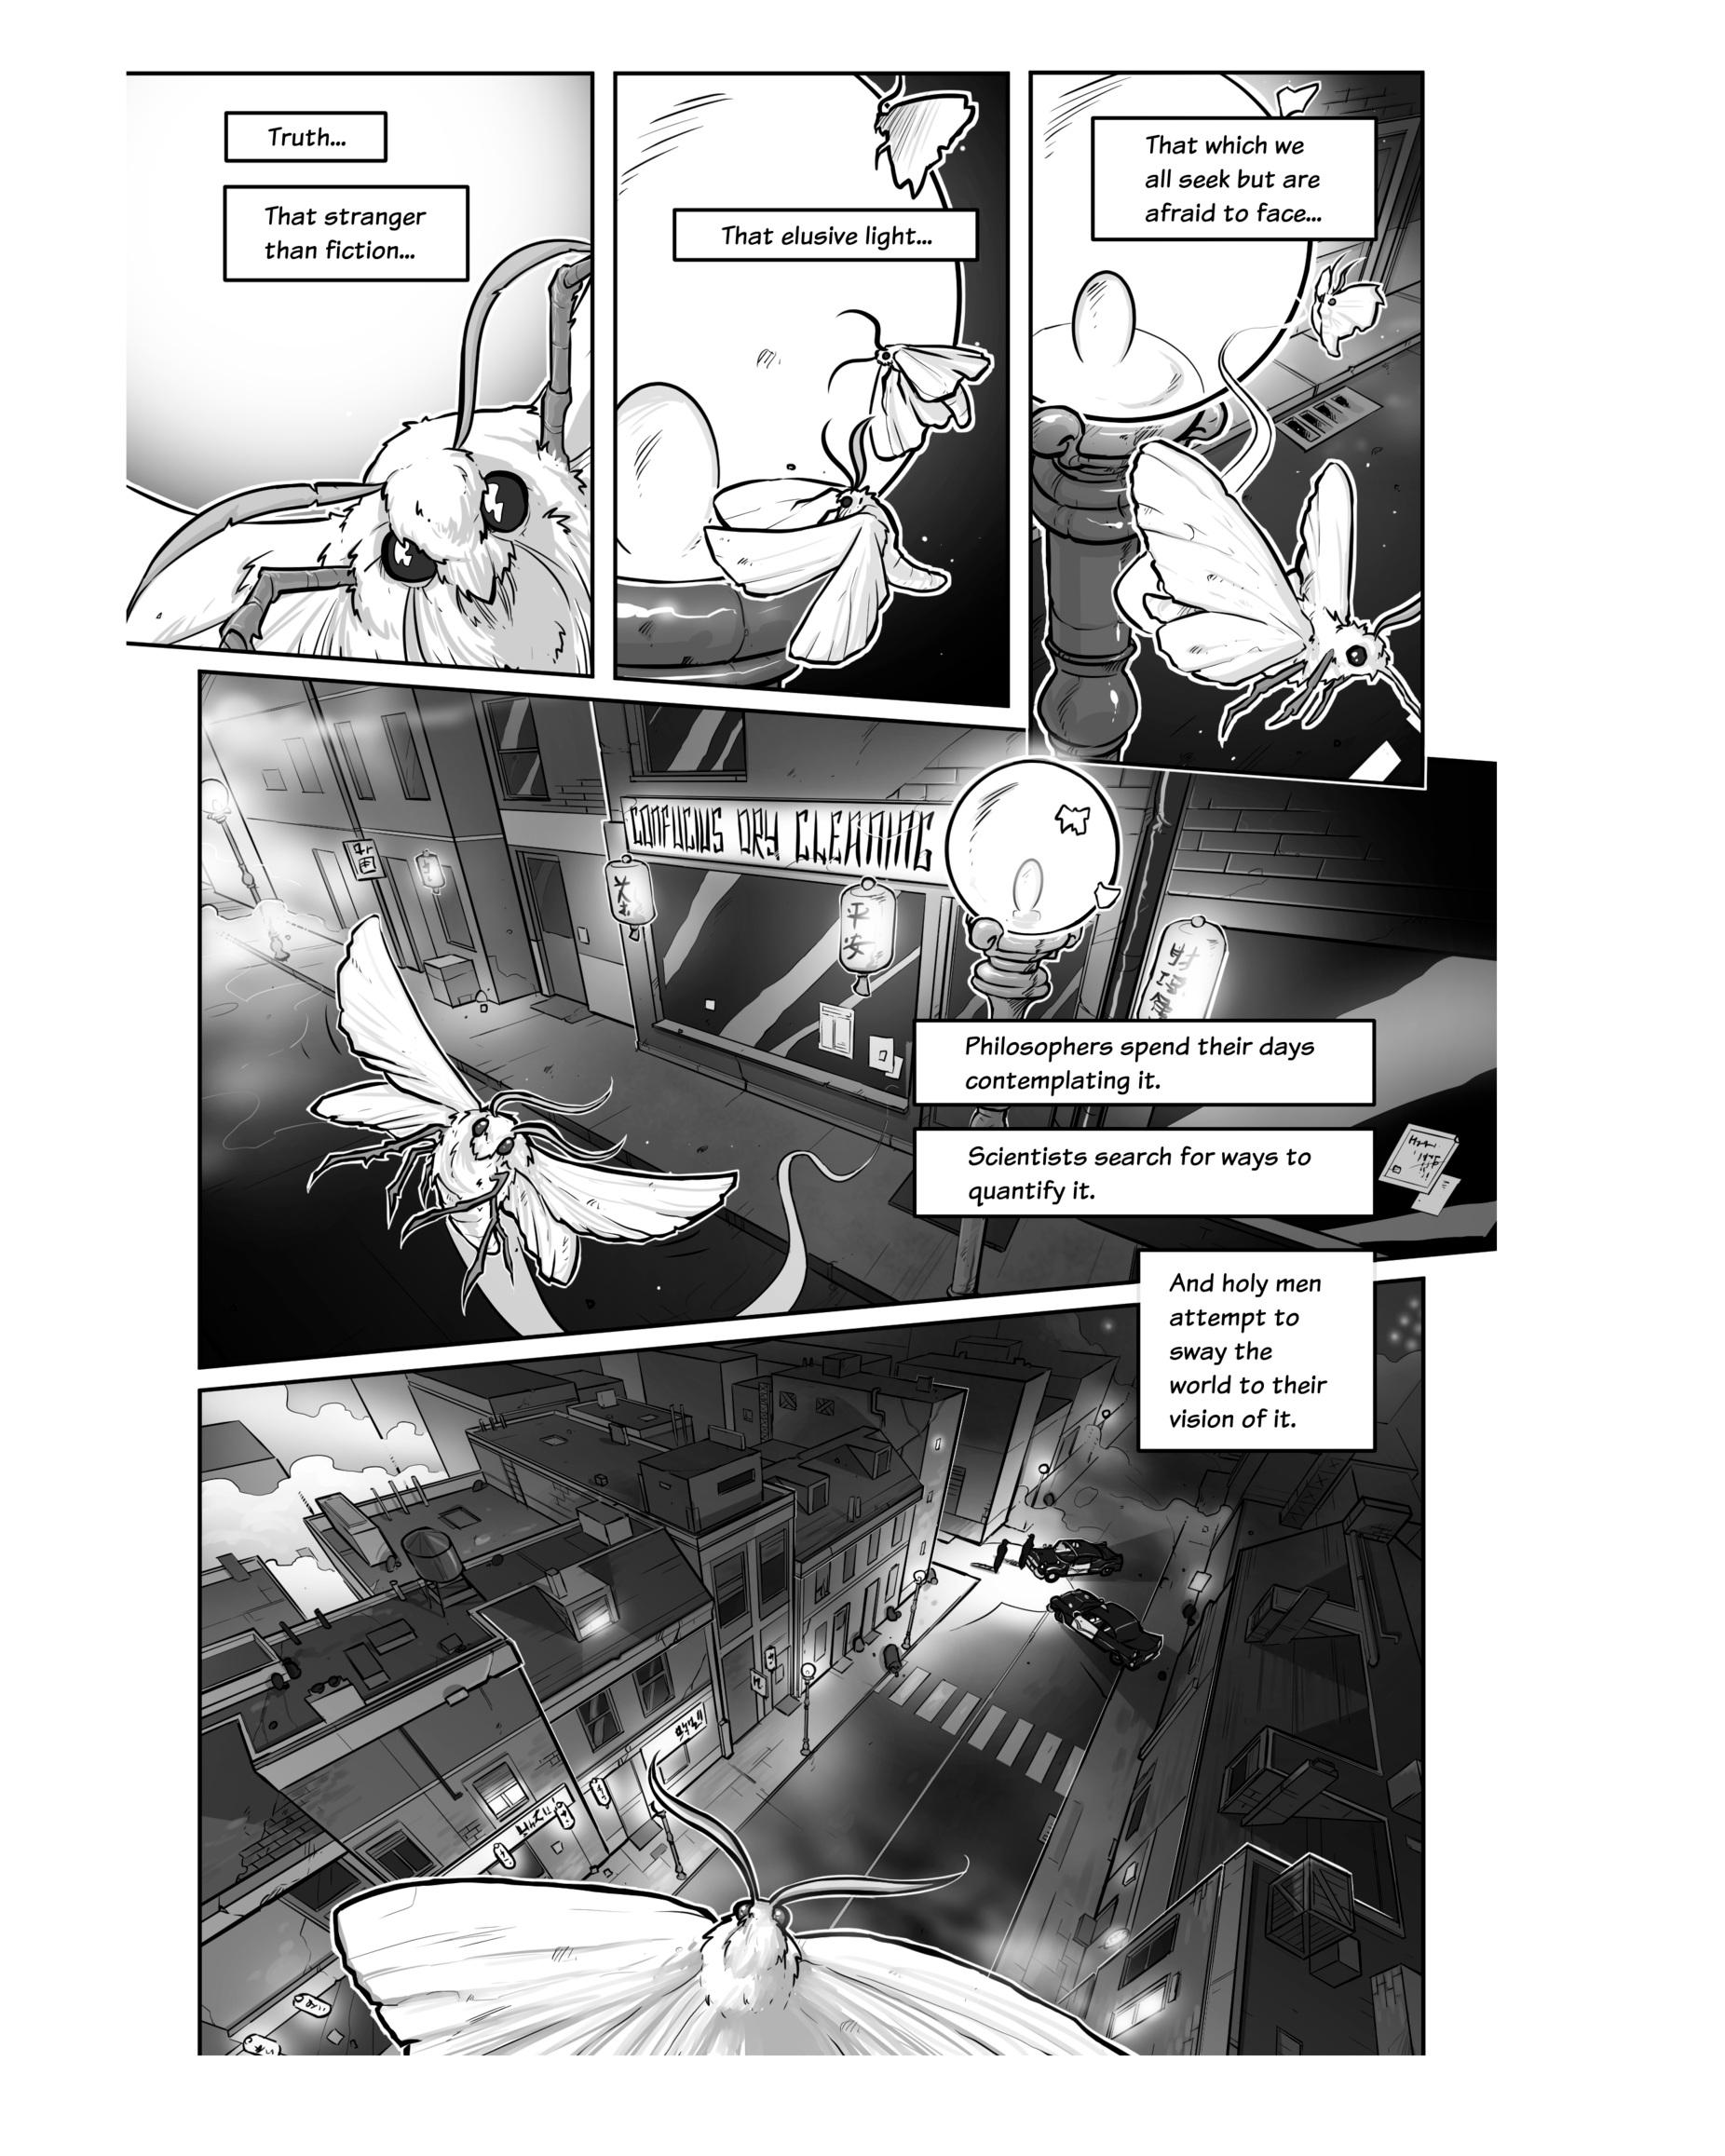 owatw_1+PAGE+1+WEB.jpg